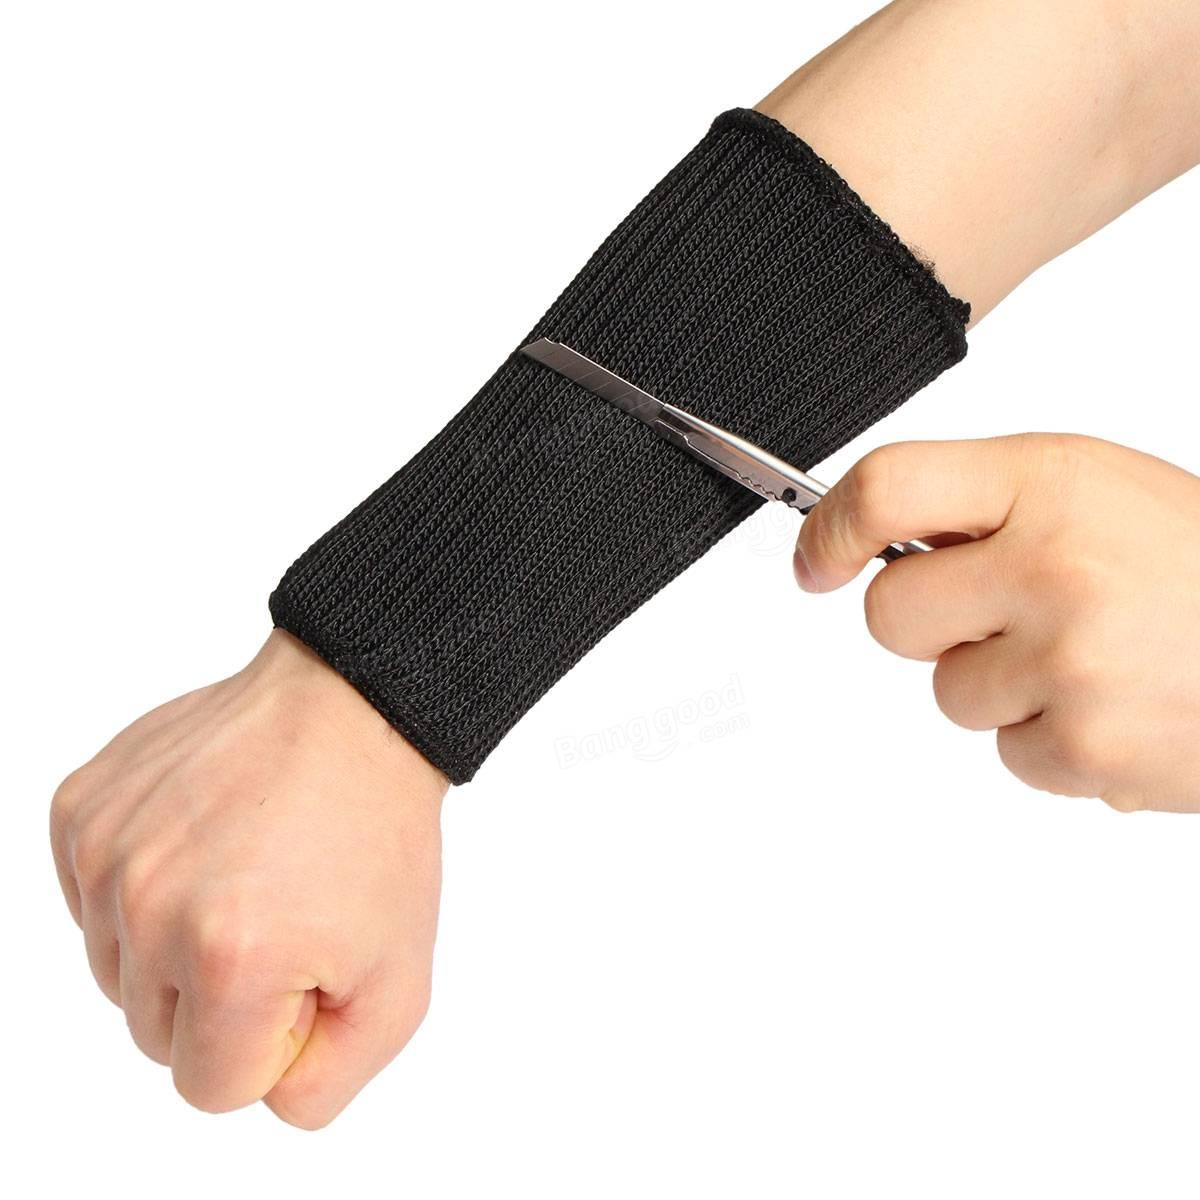 Black kevlar knife resistant arm sleeve anti cut